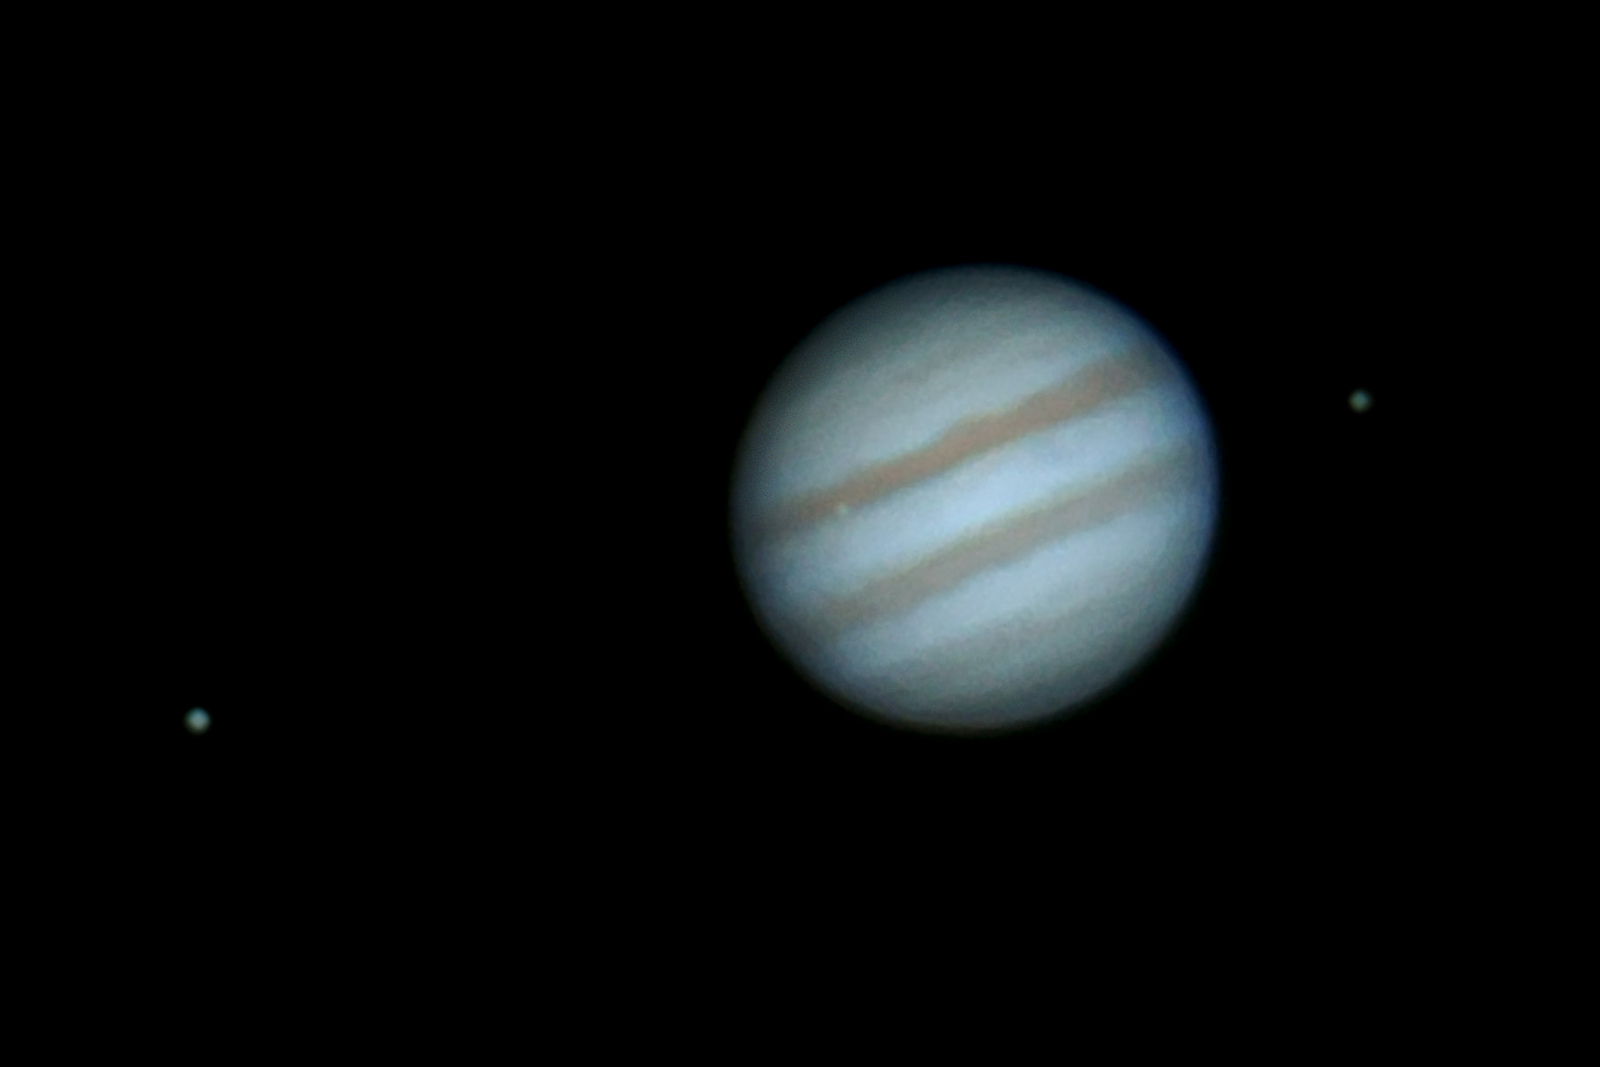 Jupiter with Ganymede Io(transiting) & Europa @ not so bad